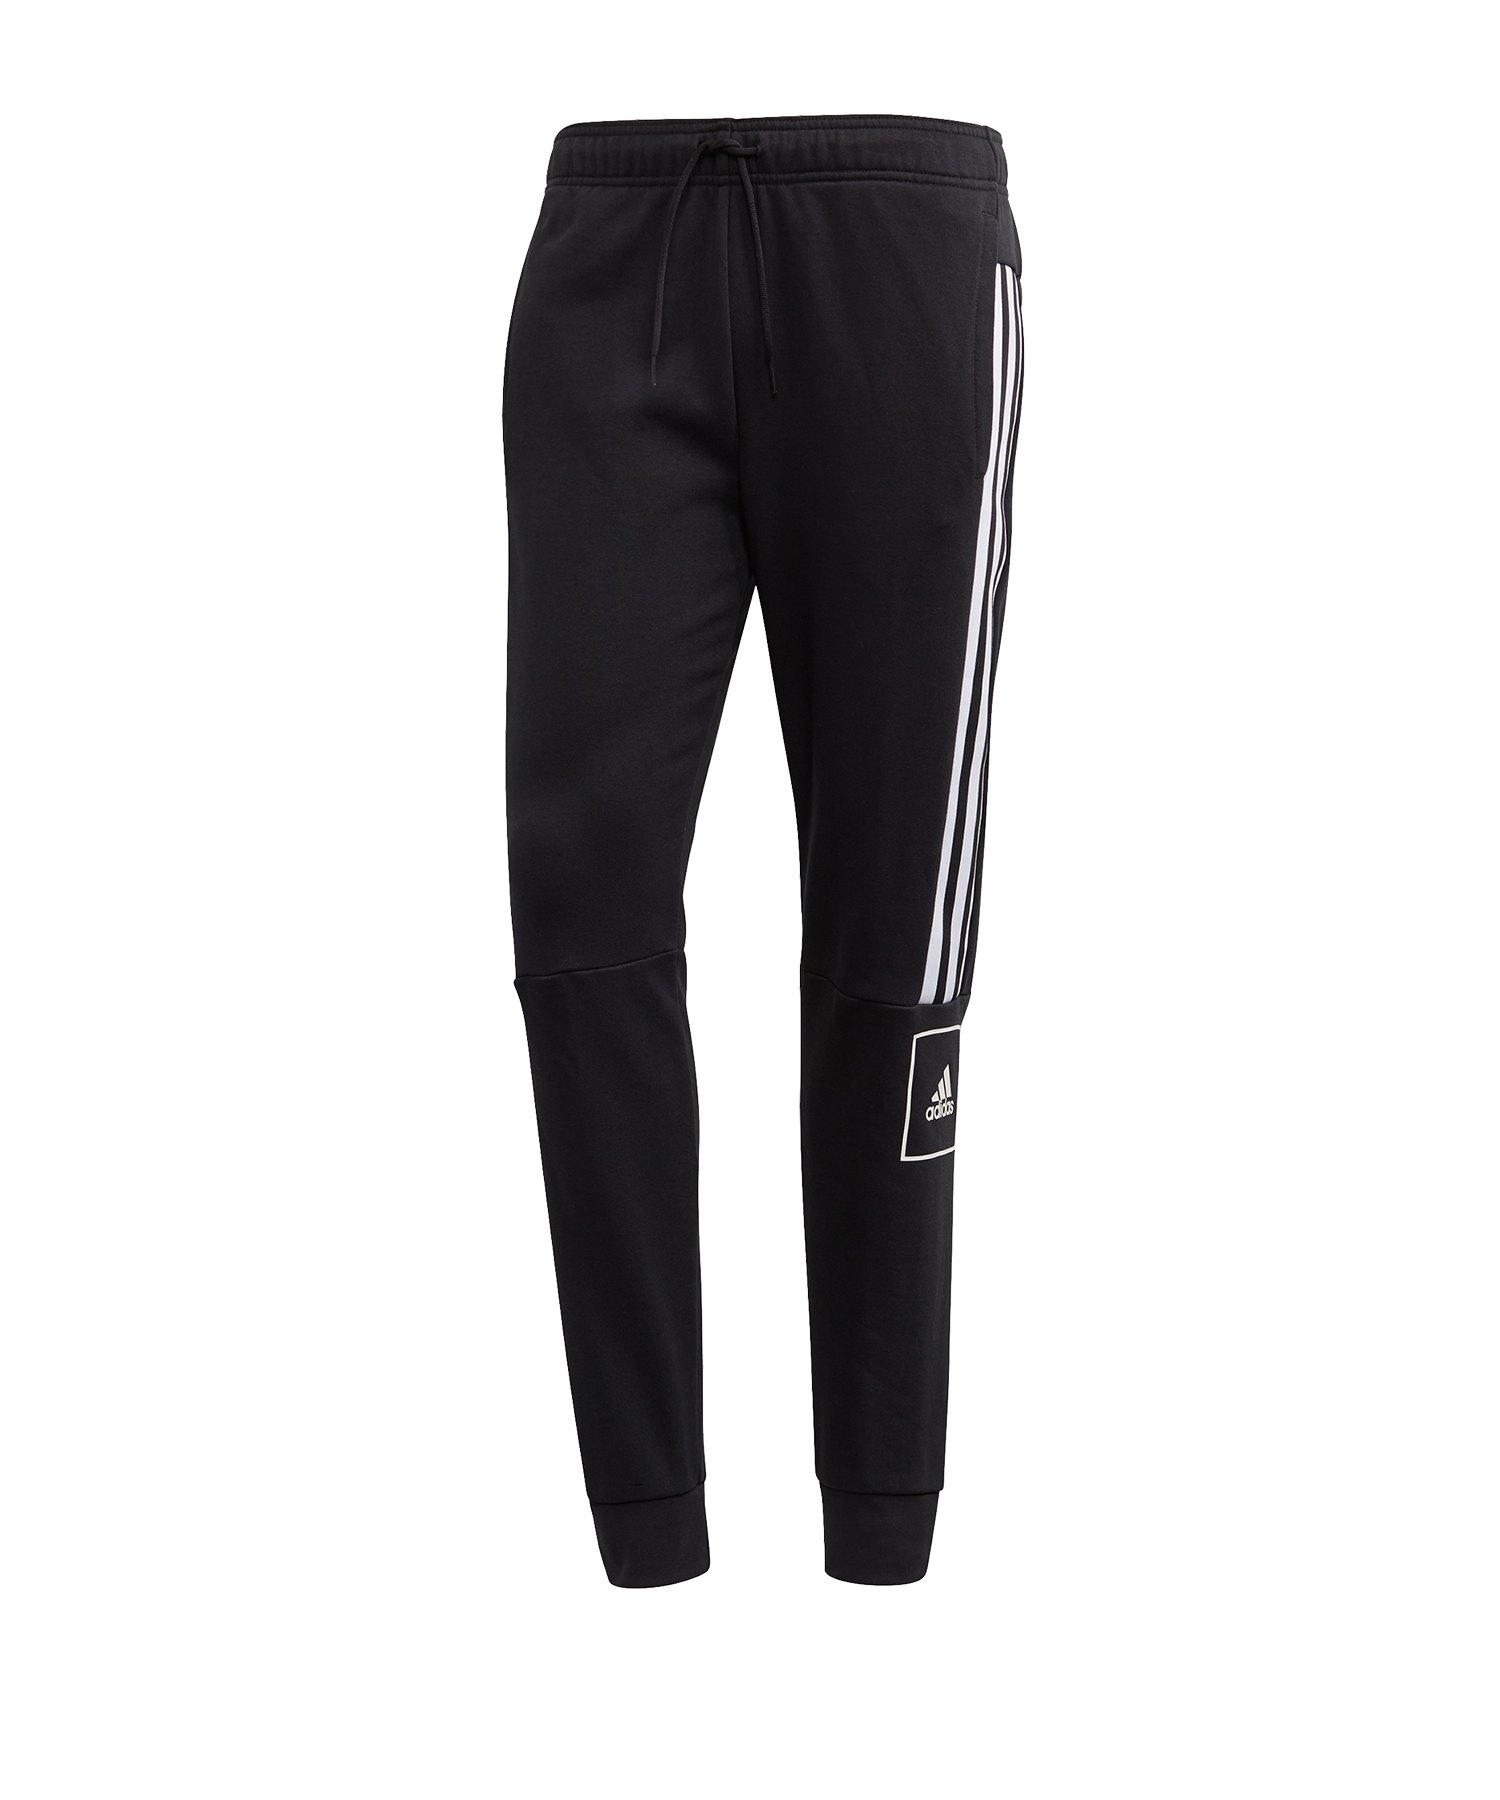 adidas 3s Pant Jogginghose lang Schwarz - schwarz